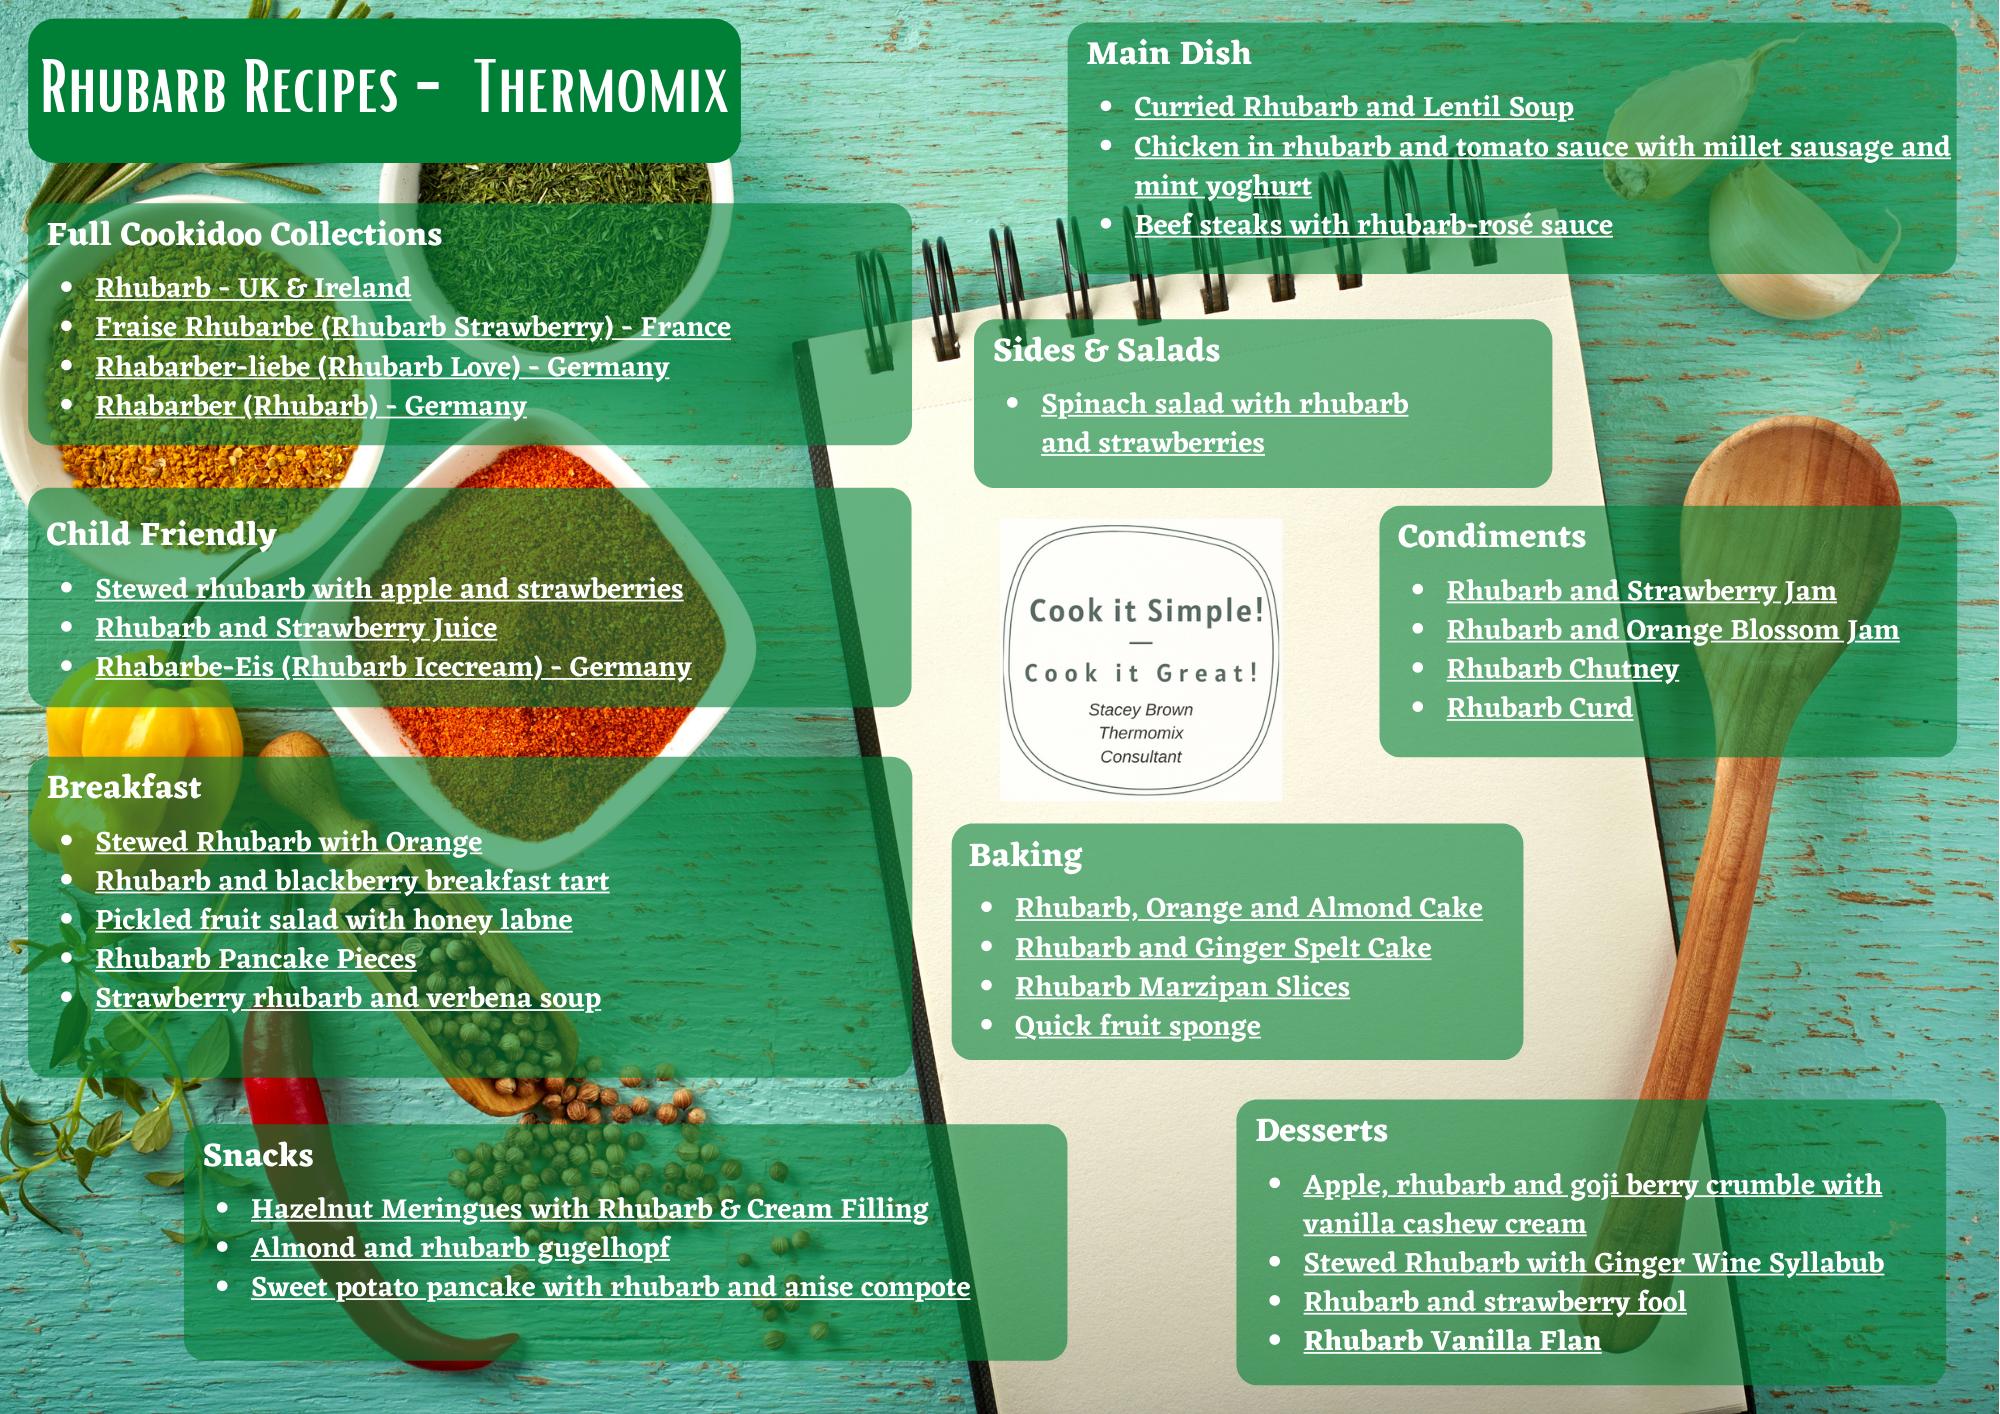 Rhubarb Recipes on Cookidoo